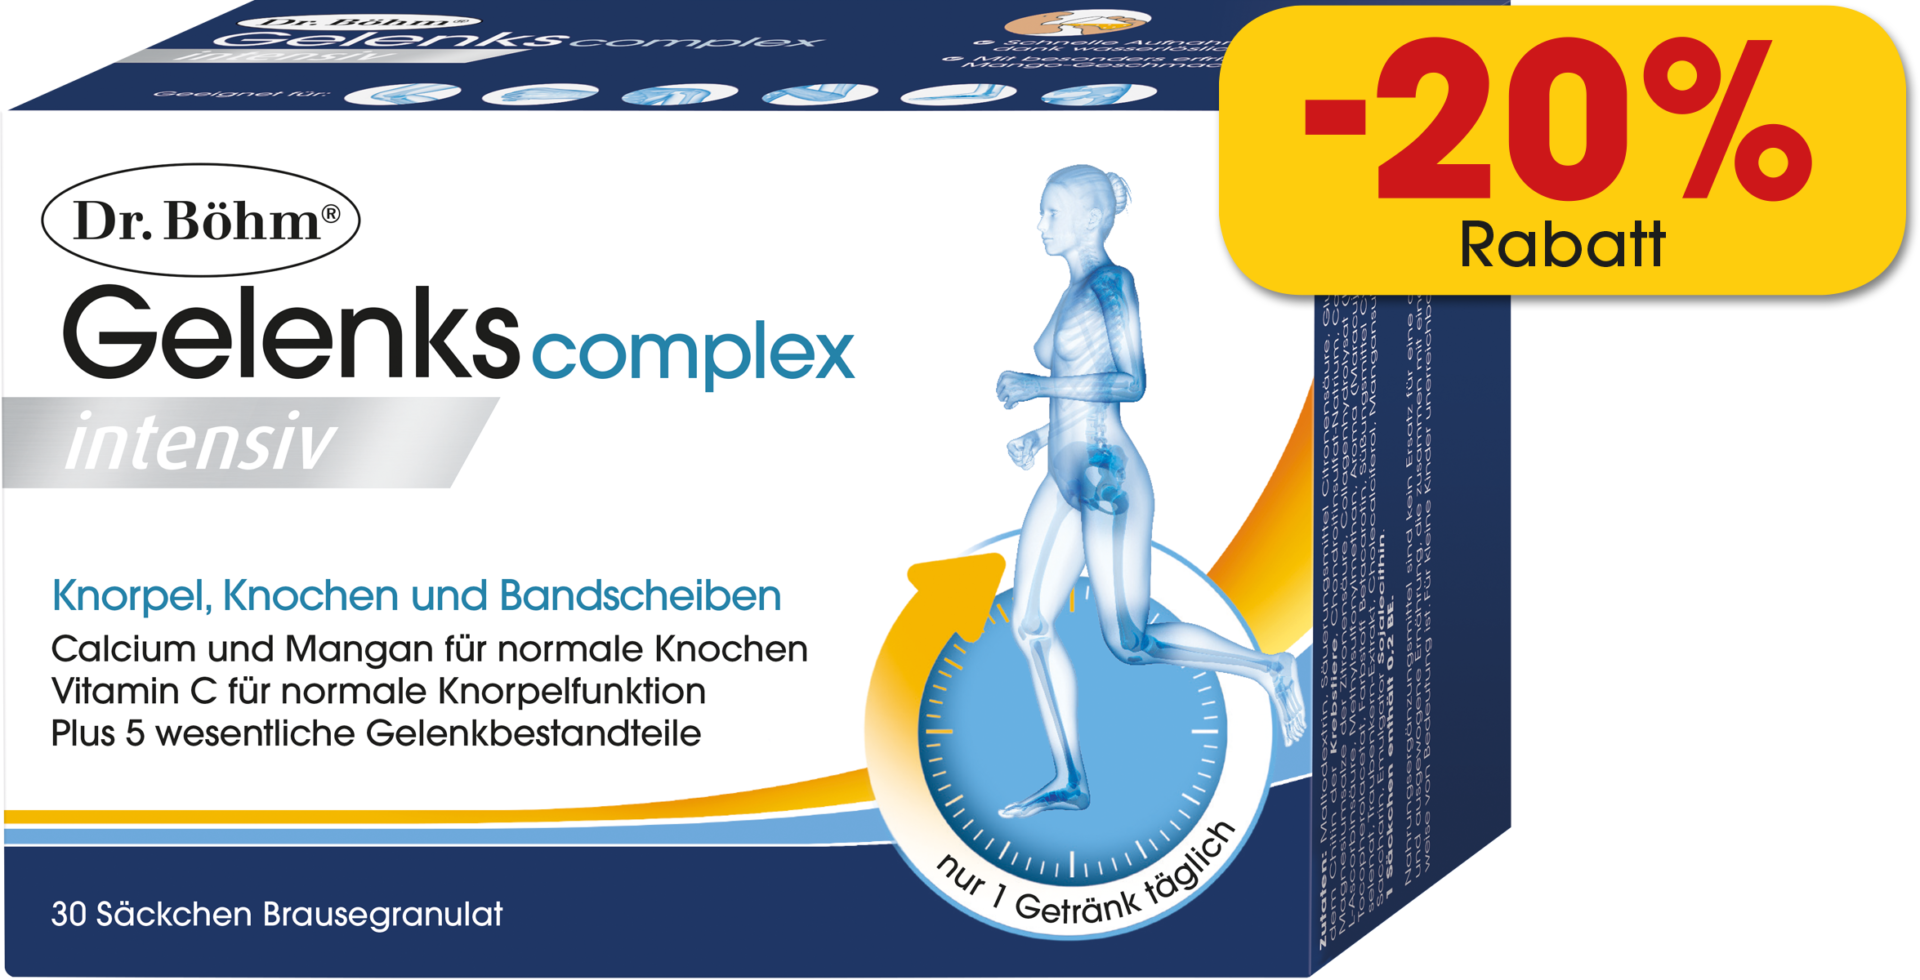 Dr. Böhm® Gelenks complex intensiv Brausegranulat